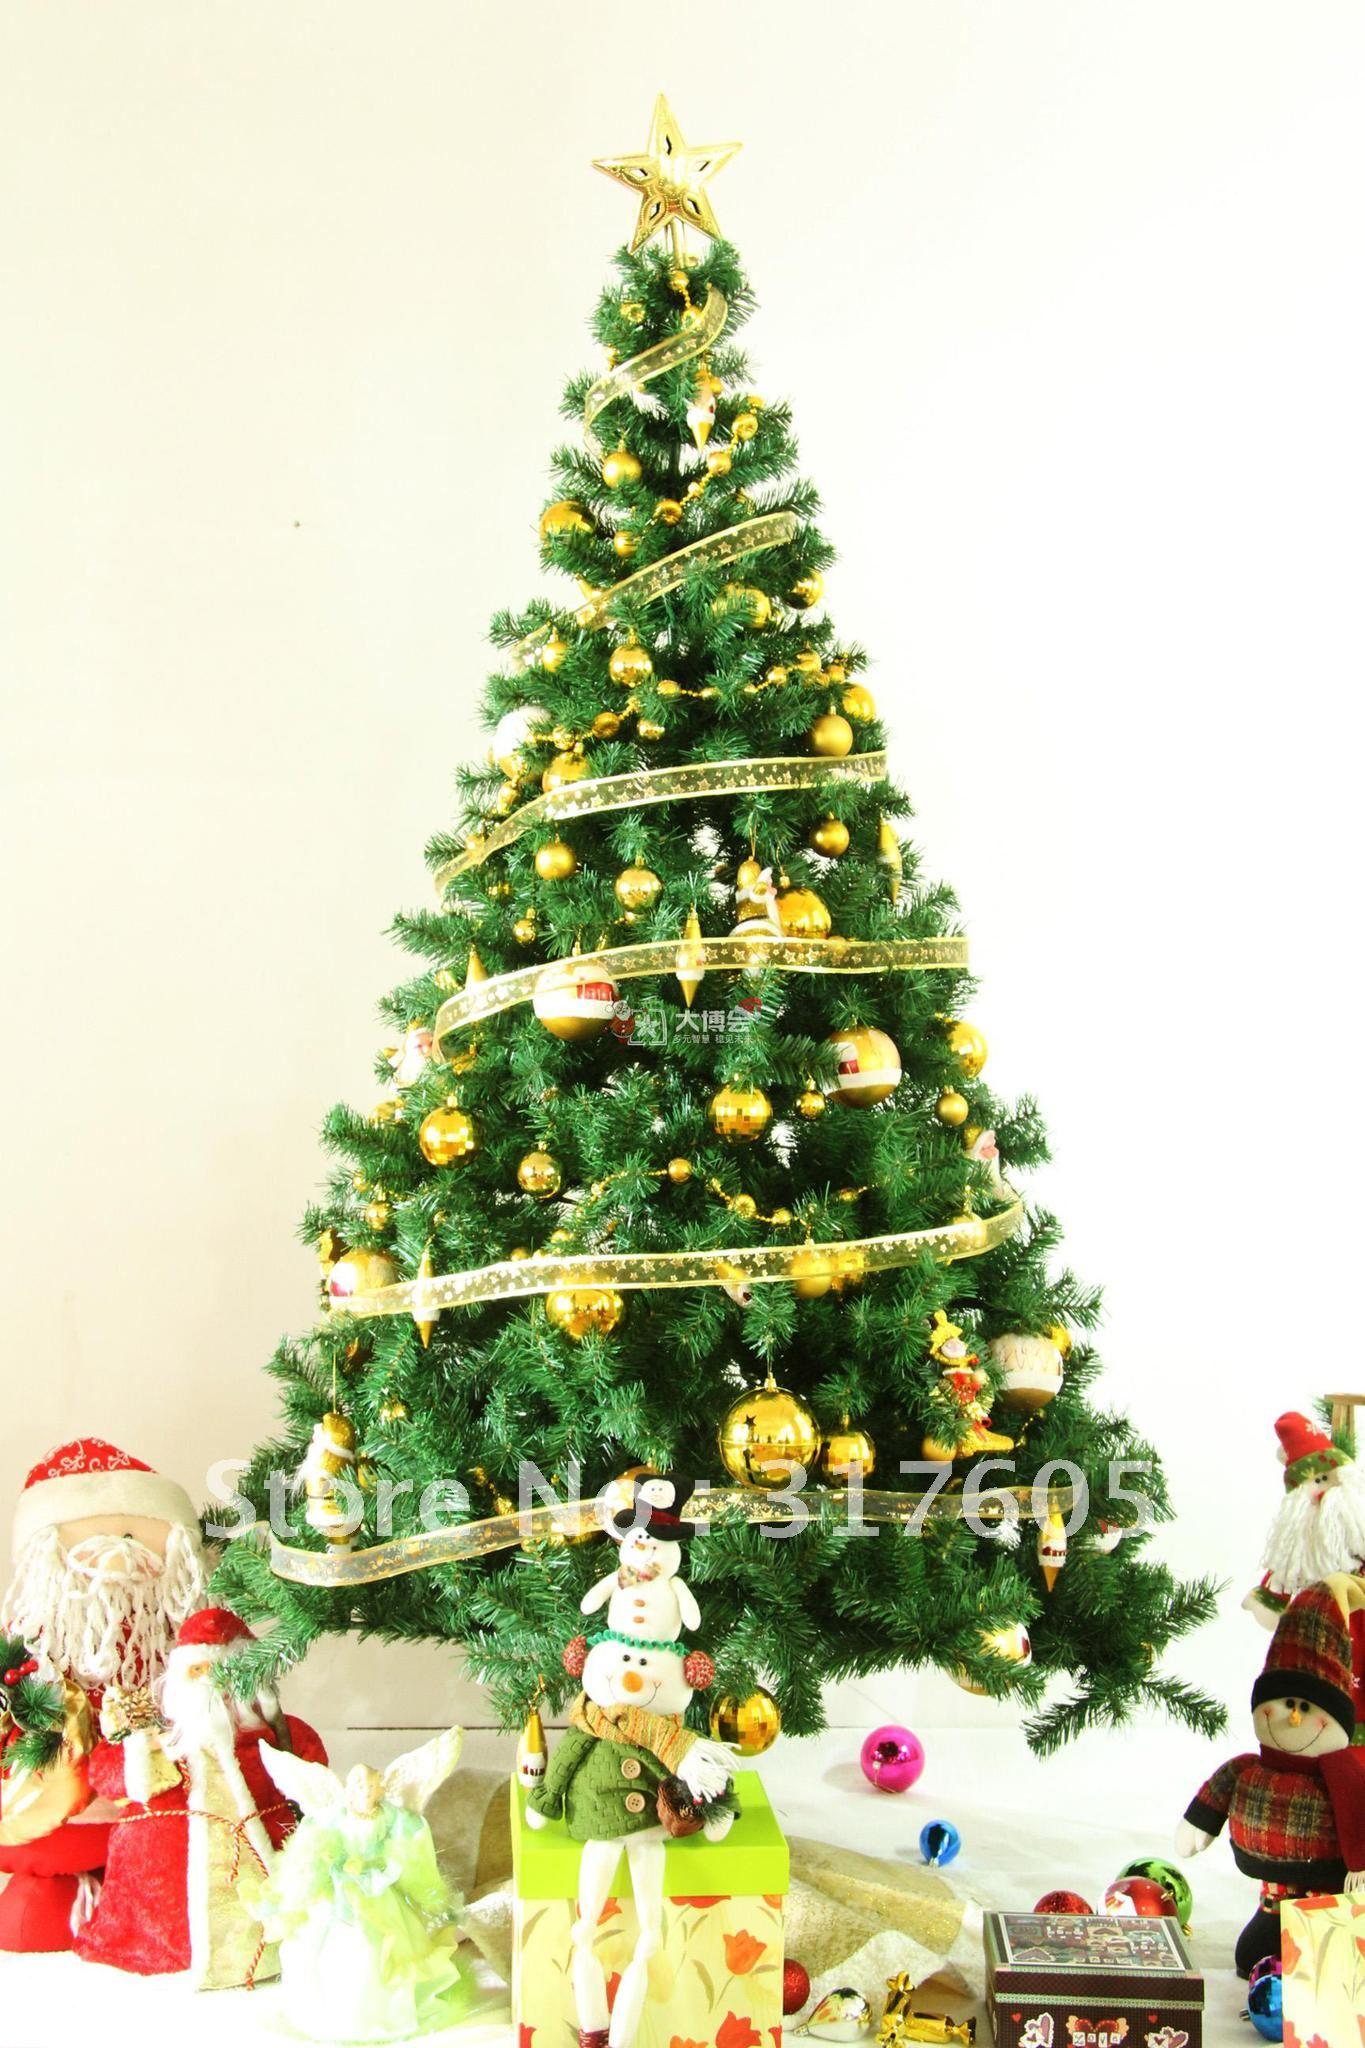 Christmas Tree Ornament Hooks Free Shipping : Free shipping wholesale christmas ornaments